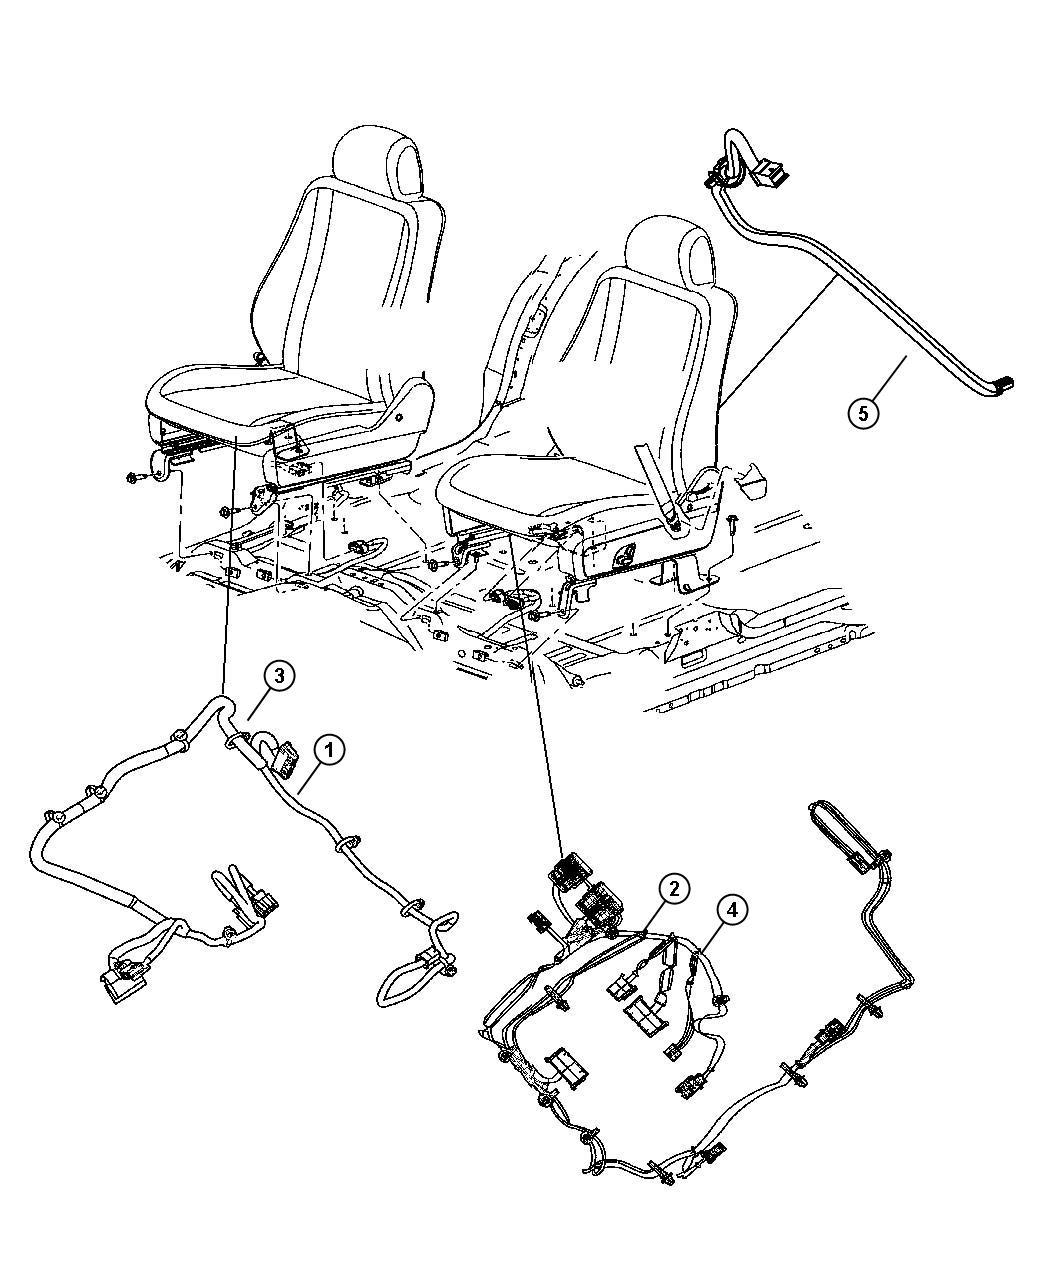 Dodge Durango Wiring Seat Export Right 2 Way Manual 2